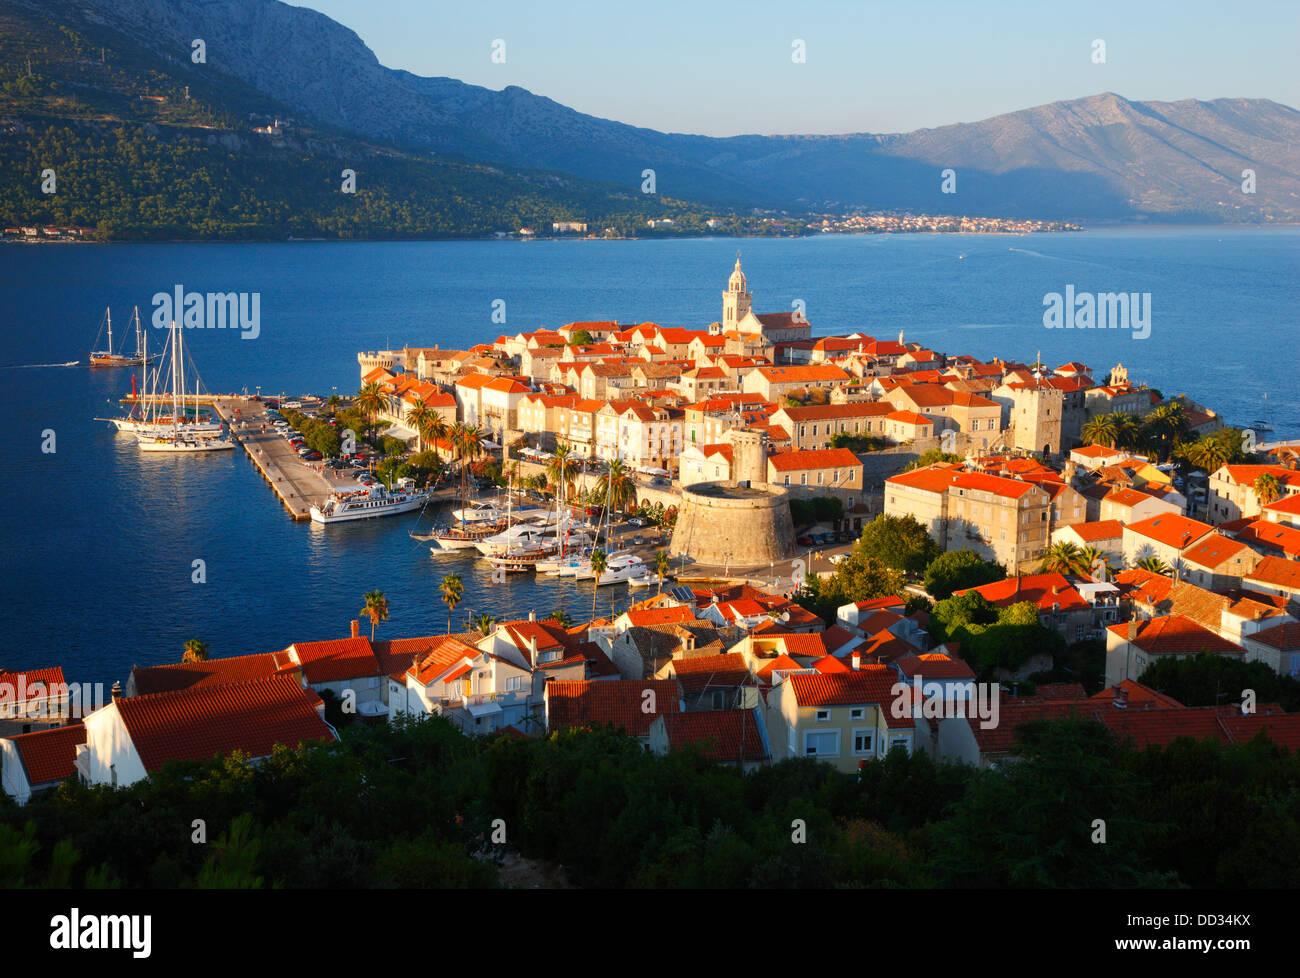 Altstadt von Korcula. Halbinsel Peljesac im Hintergrund. Stockbild